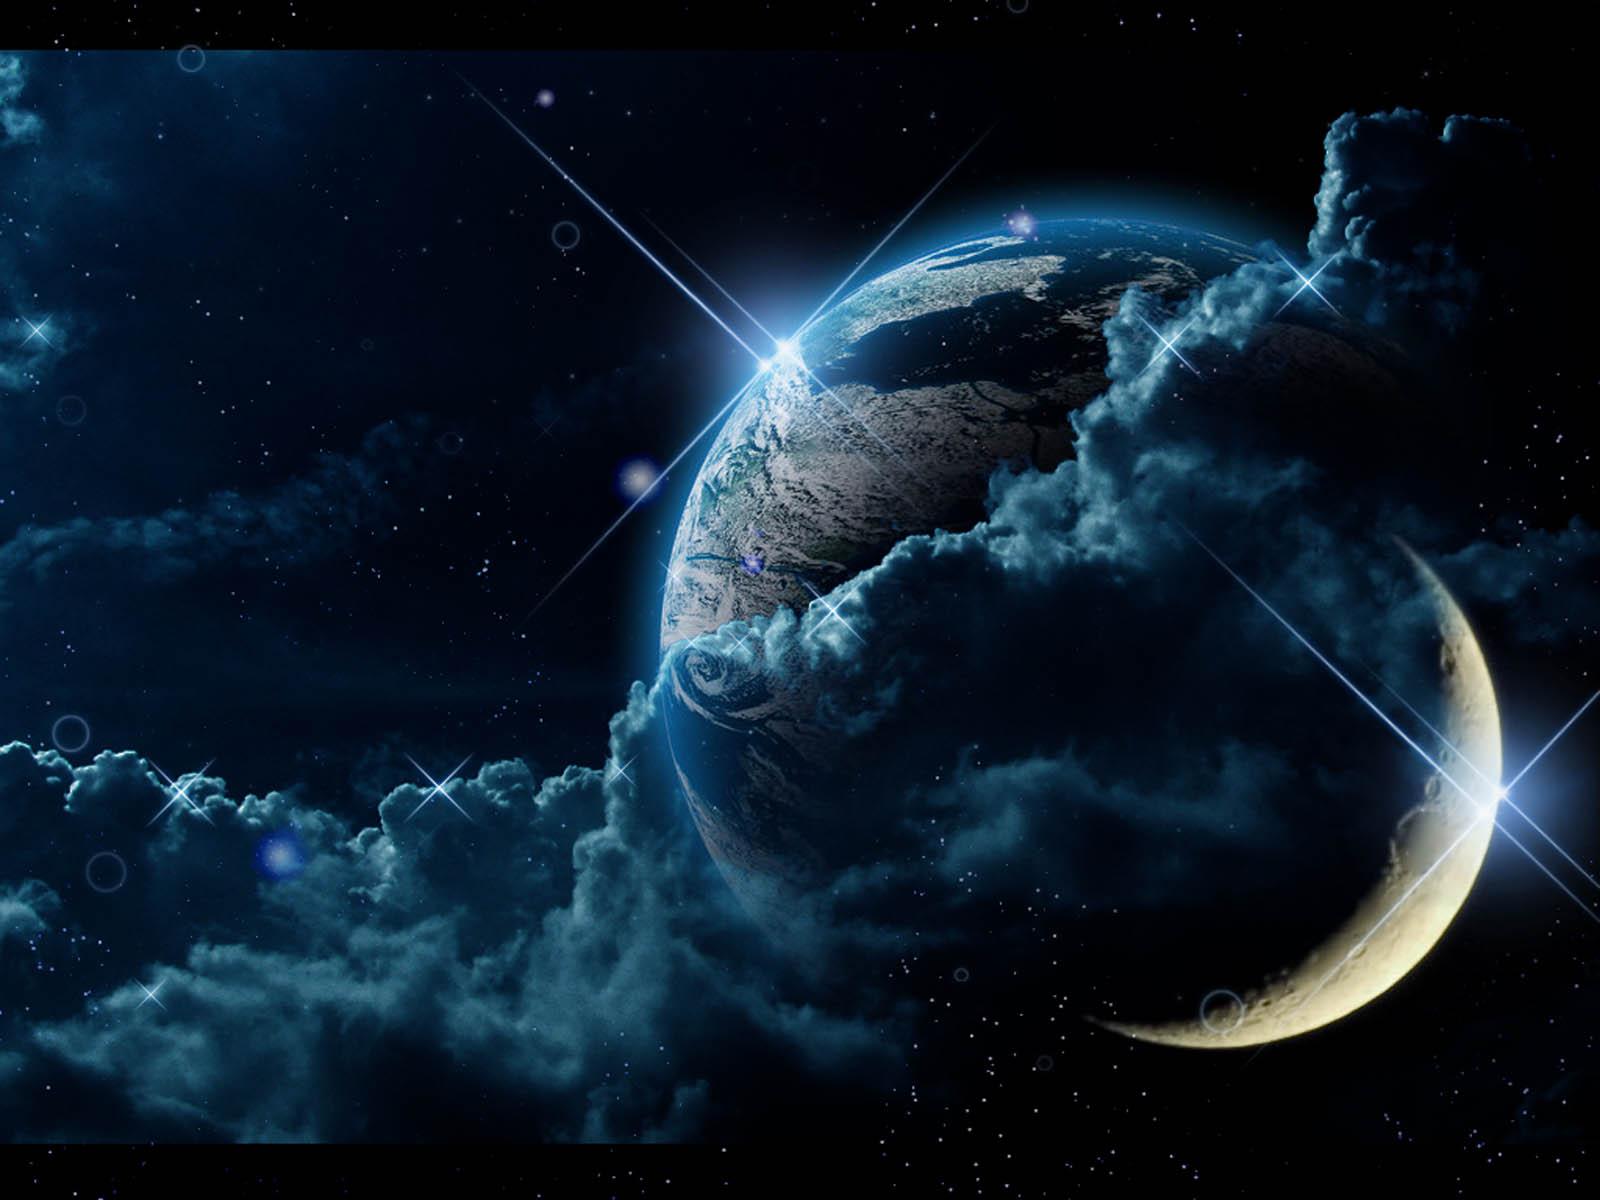 fantaisie moon